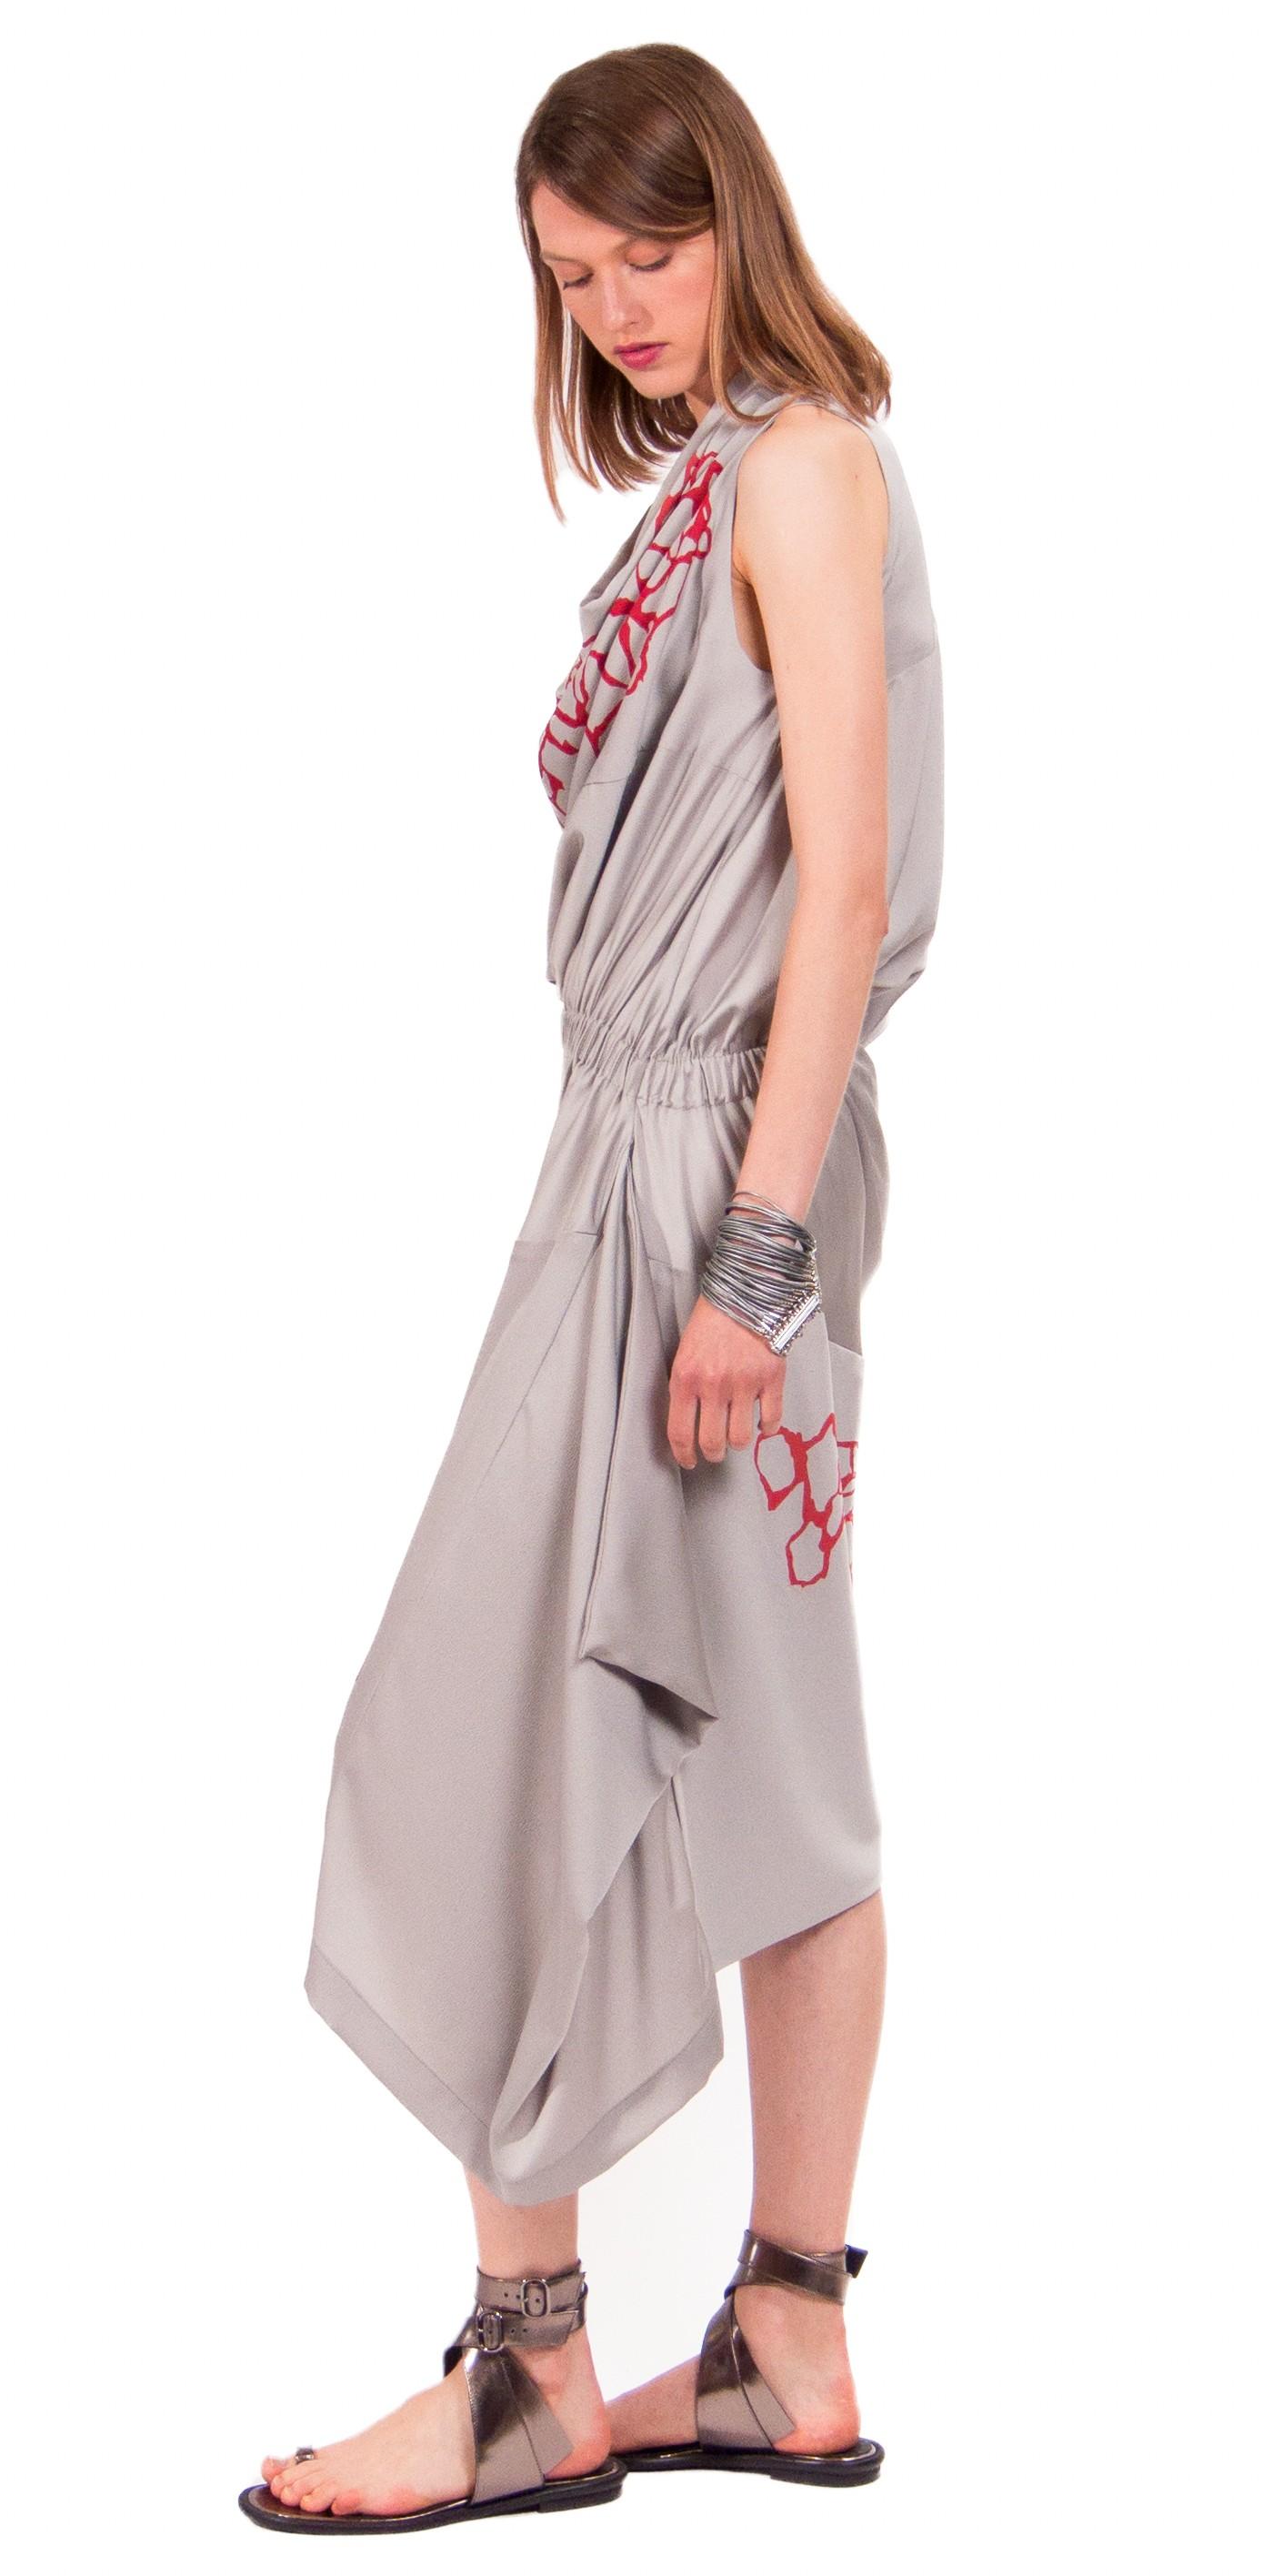 JSP STAMP ASYMMETRIC DRAPE DRESS